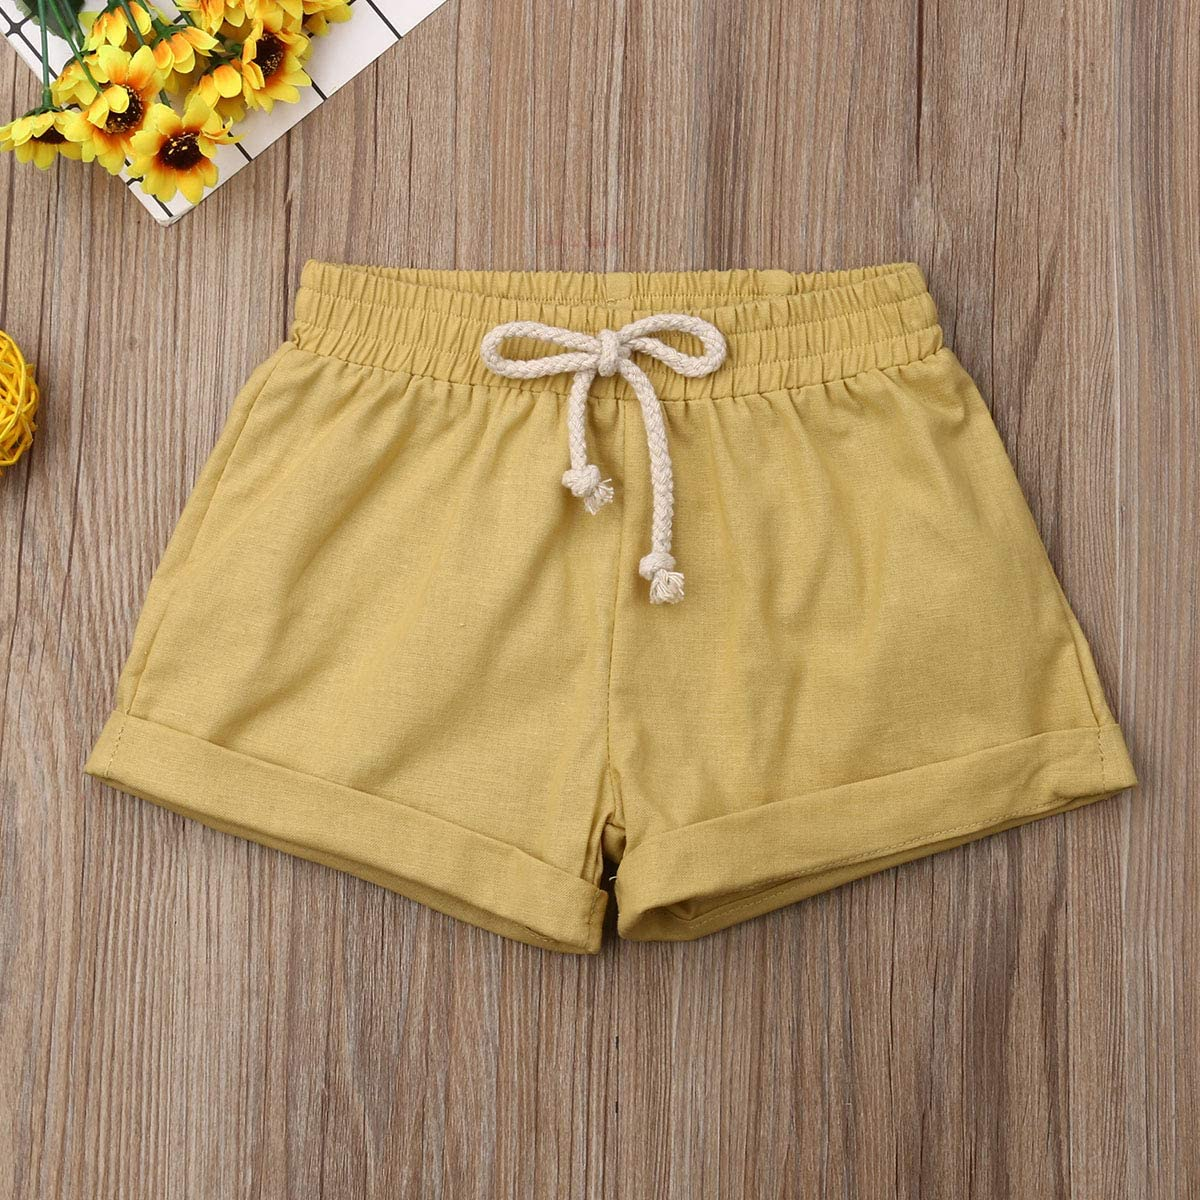 Lefyira Baby Kids Boy Casual Shorts with Pockets Elastic Waist Pants Cotton Shorts Bloomers Beachwear Outfits